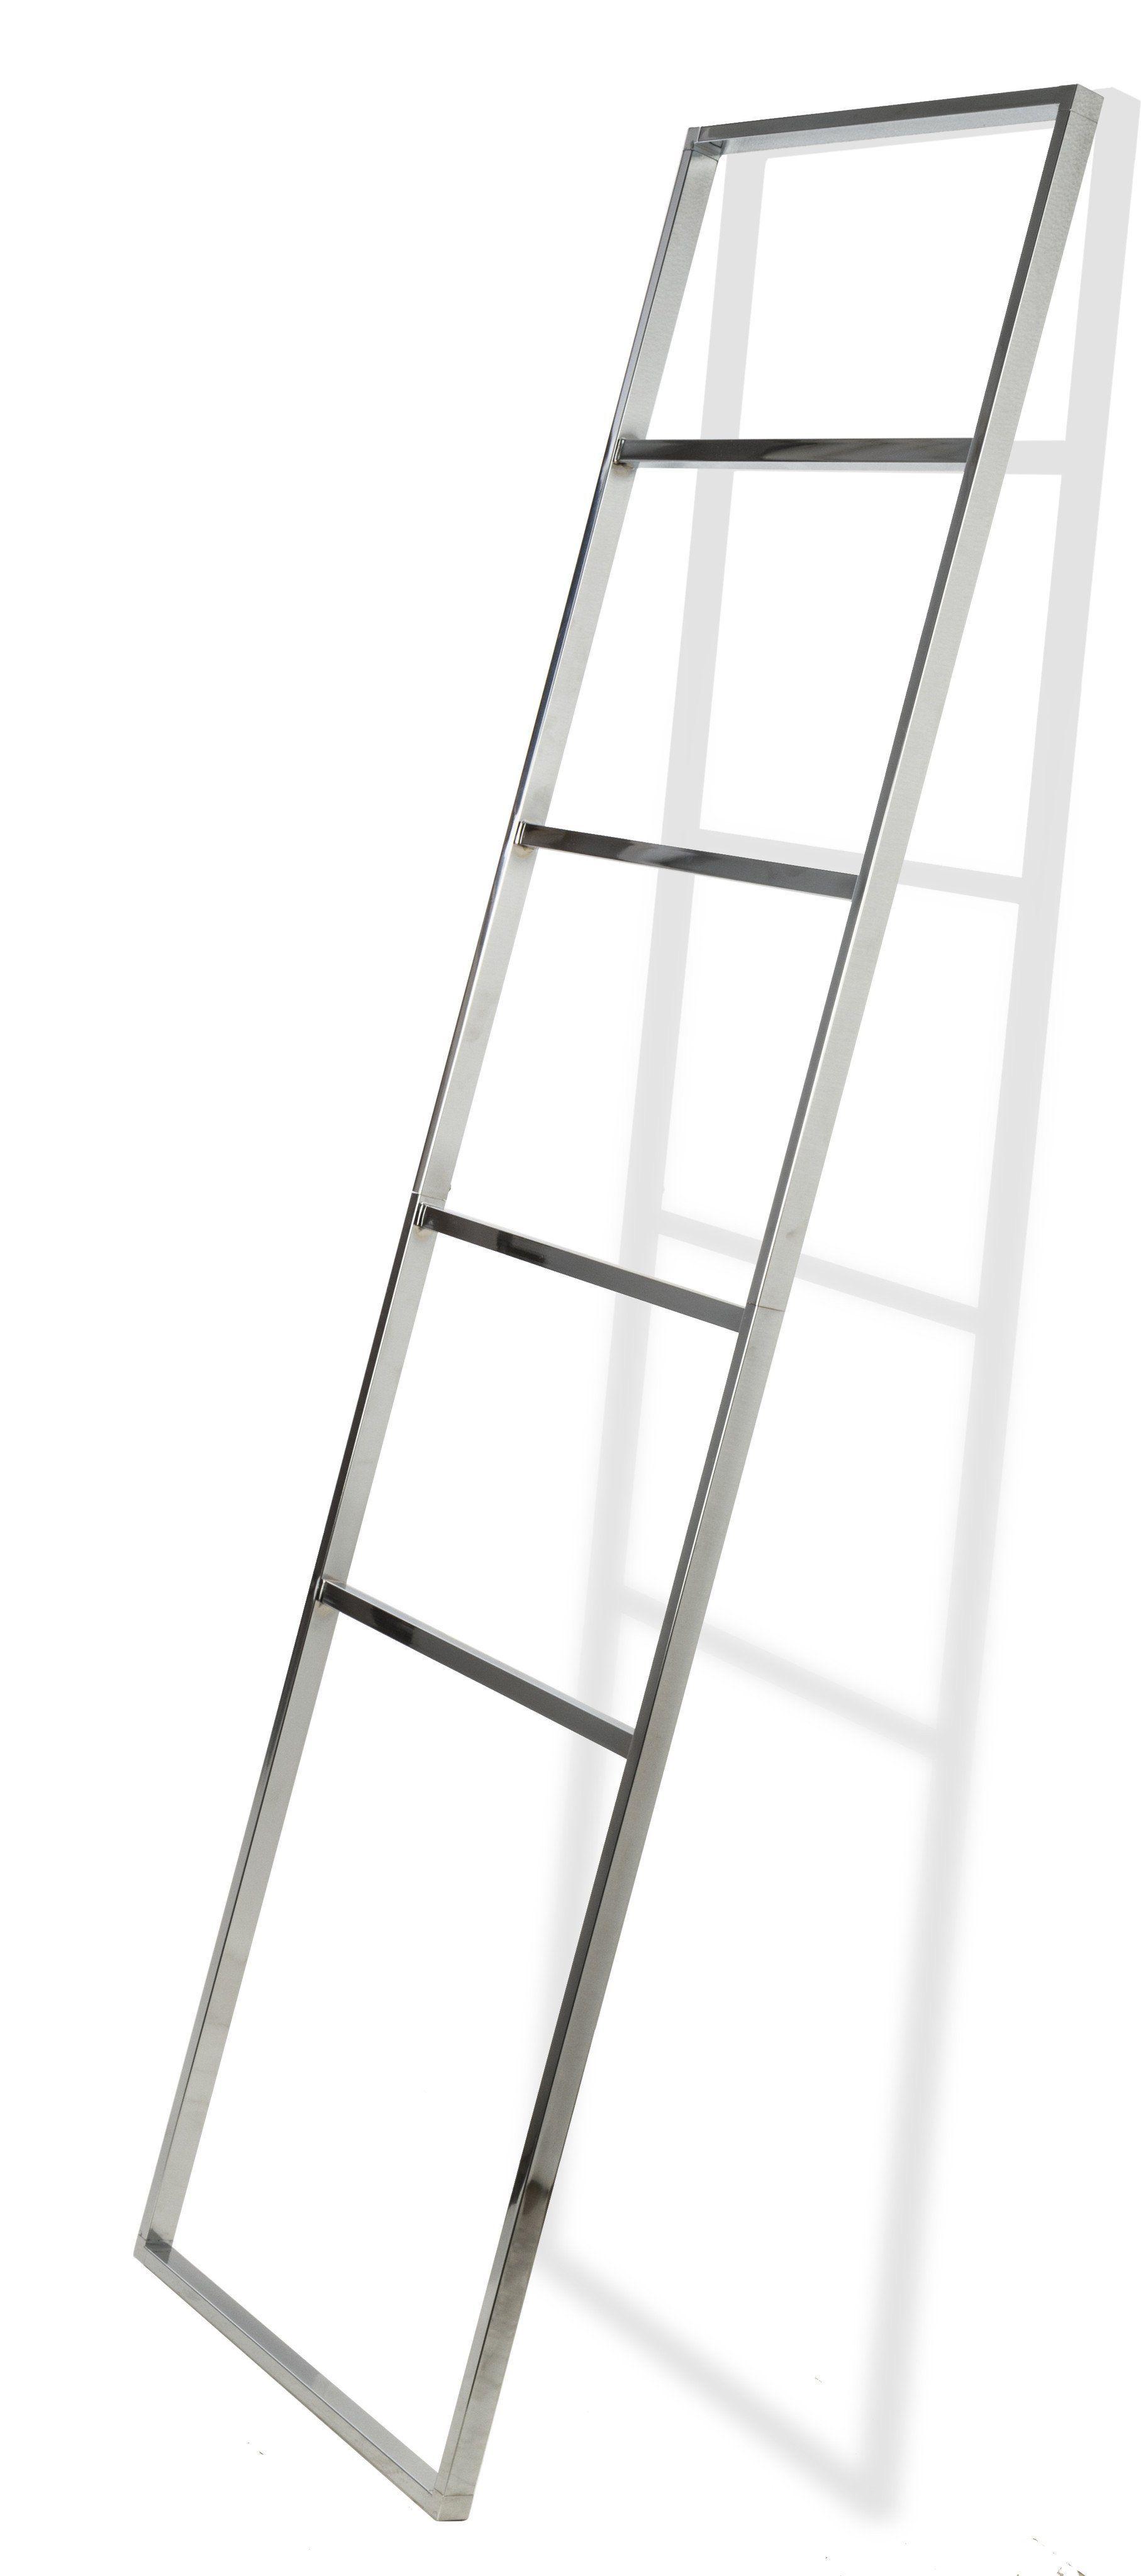 Cp Standing Towel Rack Ladder For Bathroom Spa Towel Hanger,